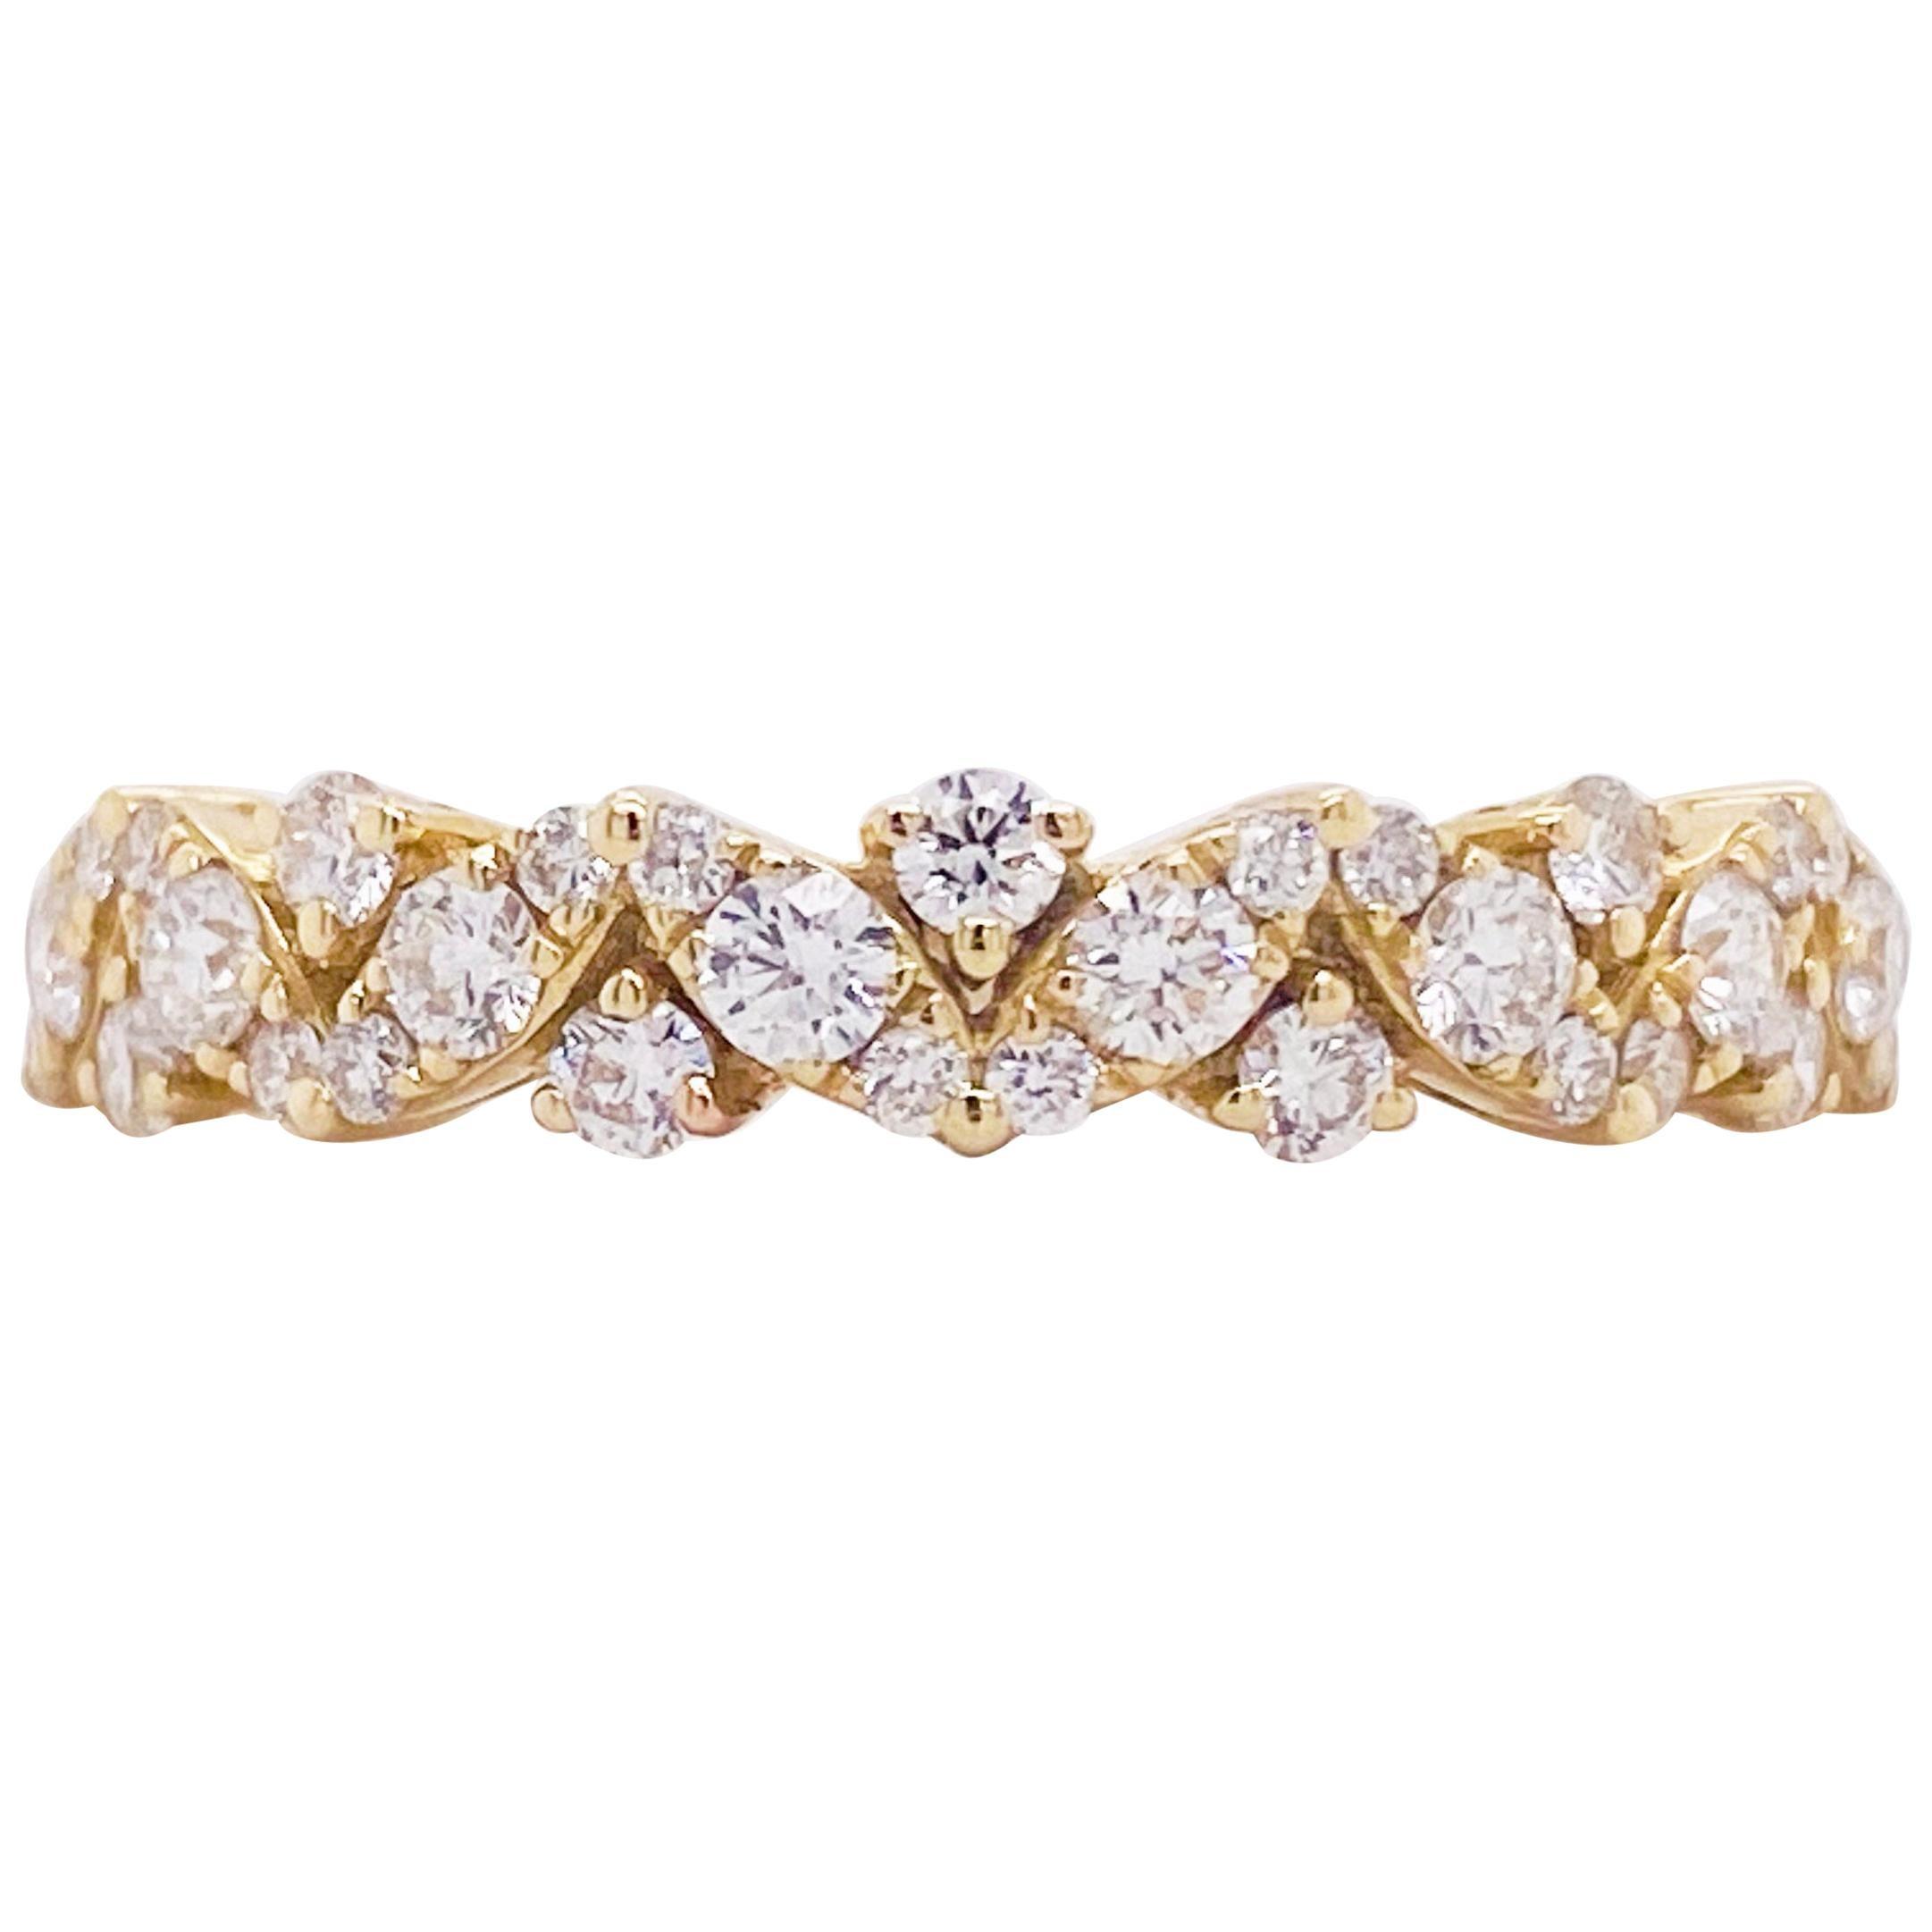 Diamond Band Ring, 14 Karat Yellow Gold Wedding Band, Zig Zag Diamond Band